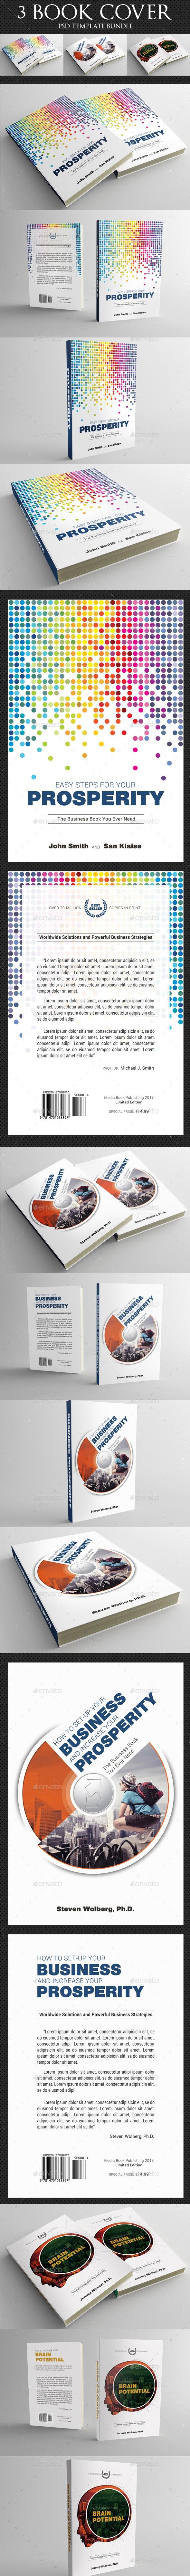 3 Corporate Book Cover Template Bundle V5 - Miscellaneous Print Templates